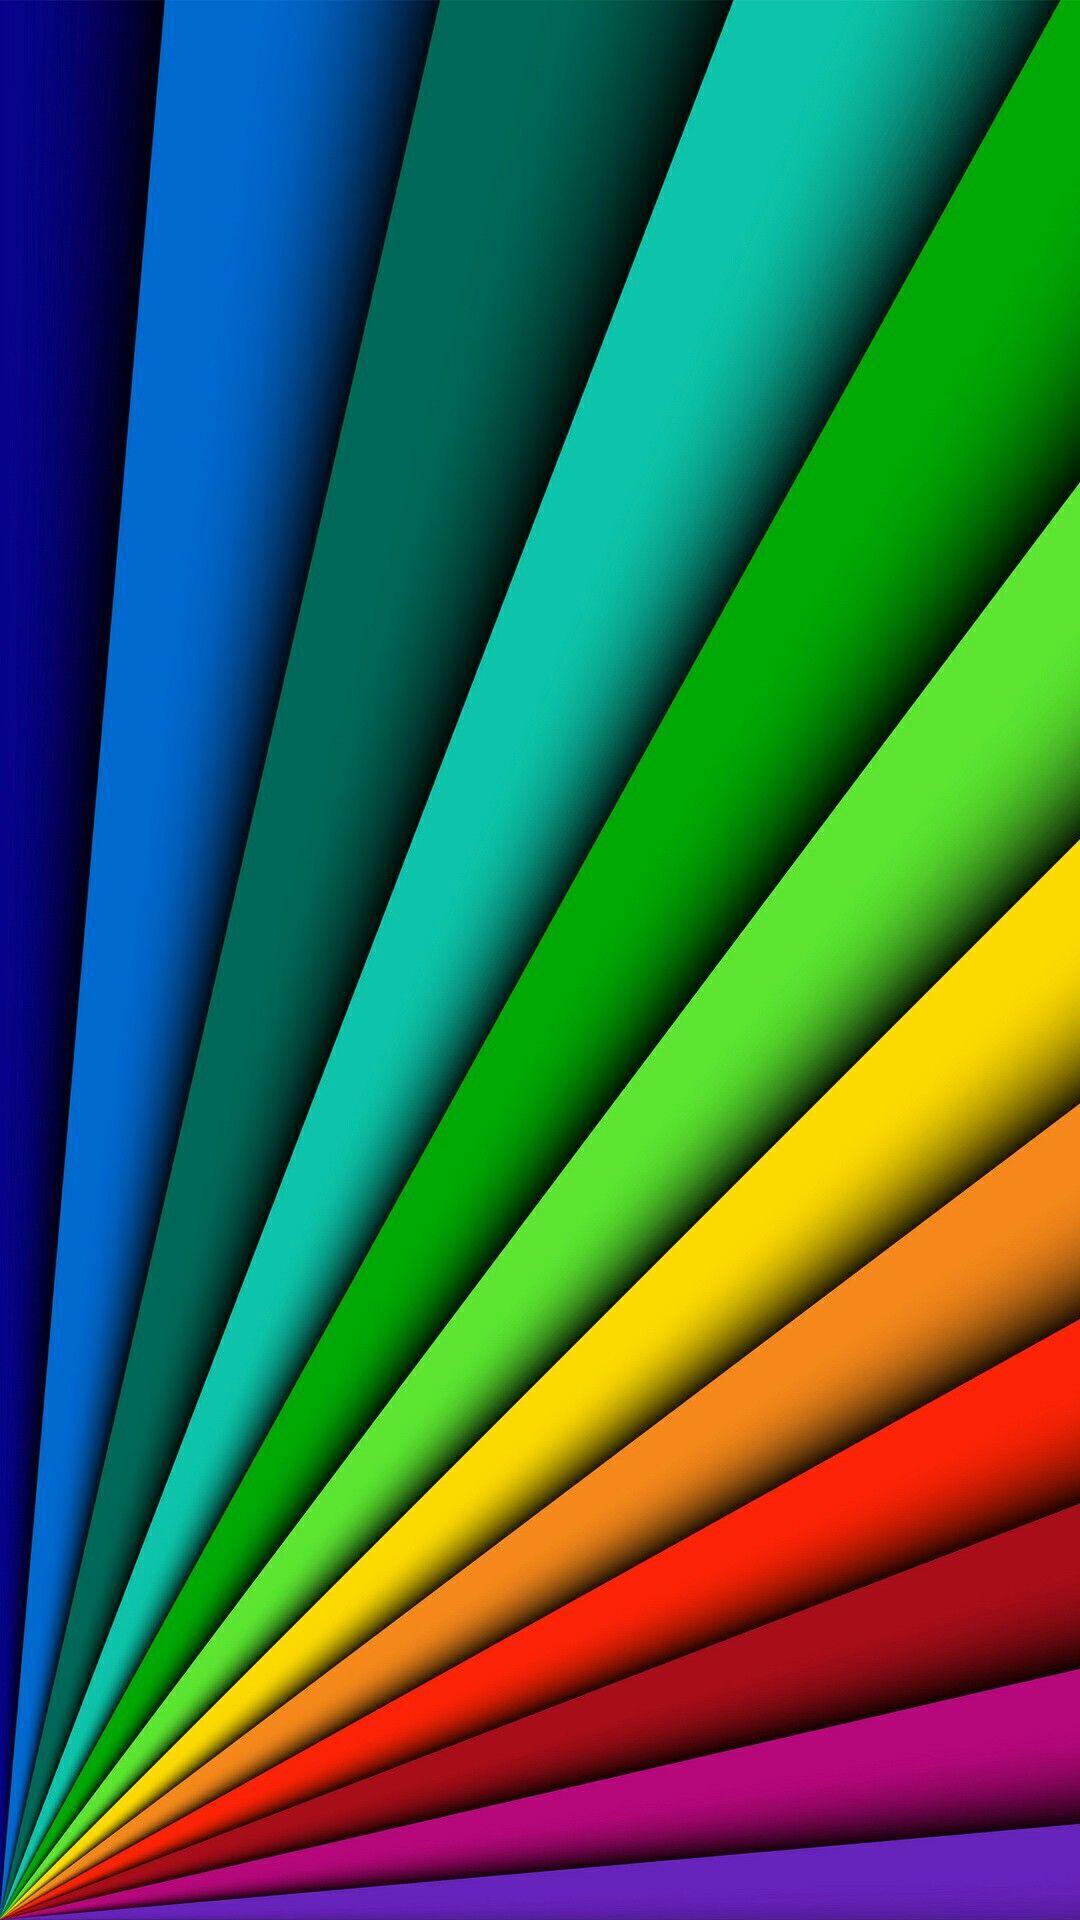 Popular Wallpaper Cell Phone Colorful - 7e32fc06b2a4f91501ff2f073bbe6059  2018_174863 .jpg